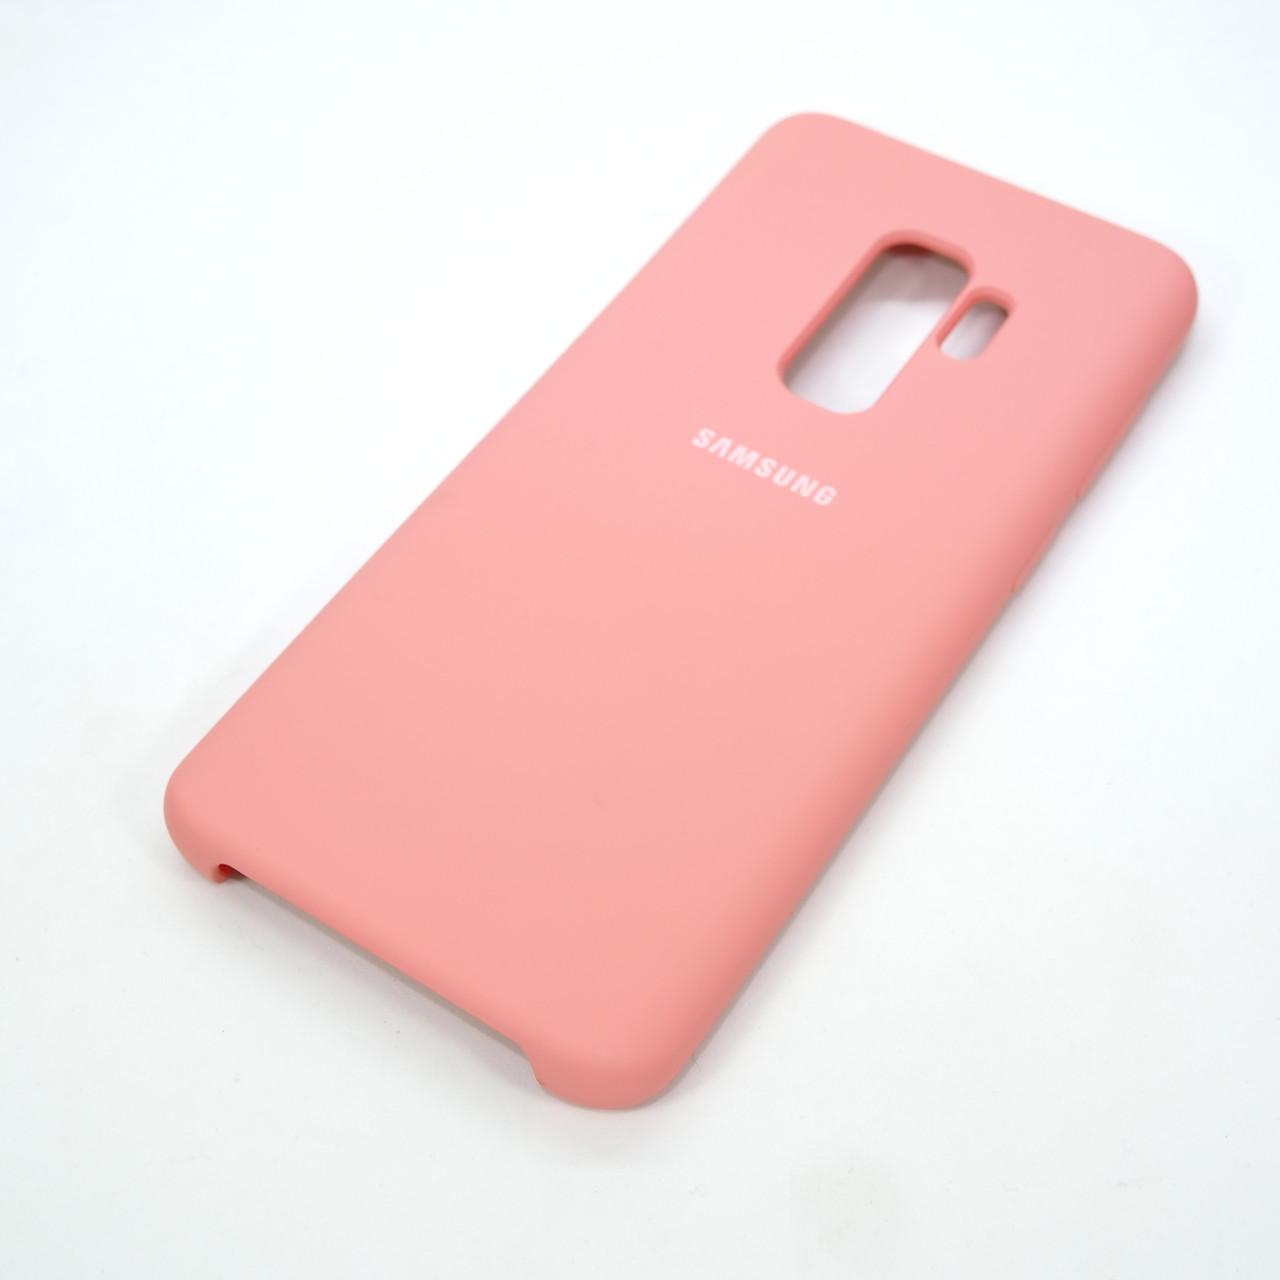 Original Soft Samsung Galaxy S9 Plus G965 pink S9+ Для телефона Розовый